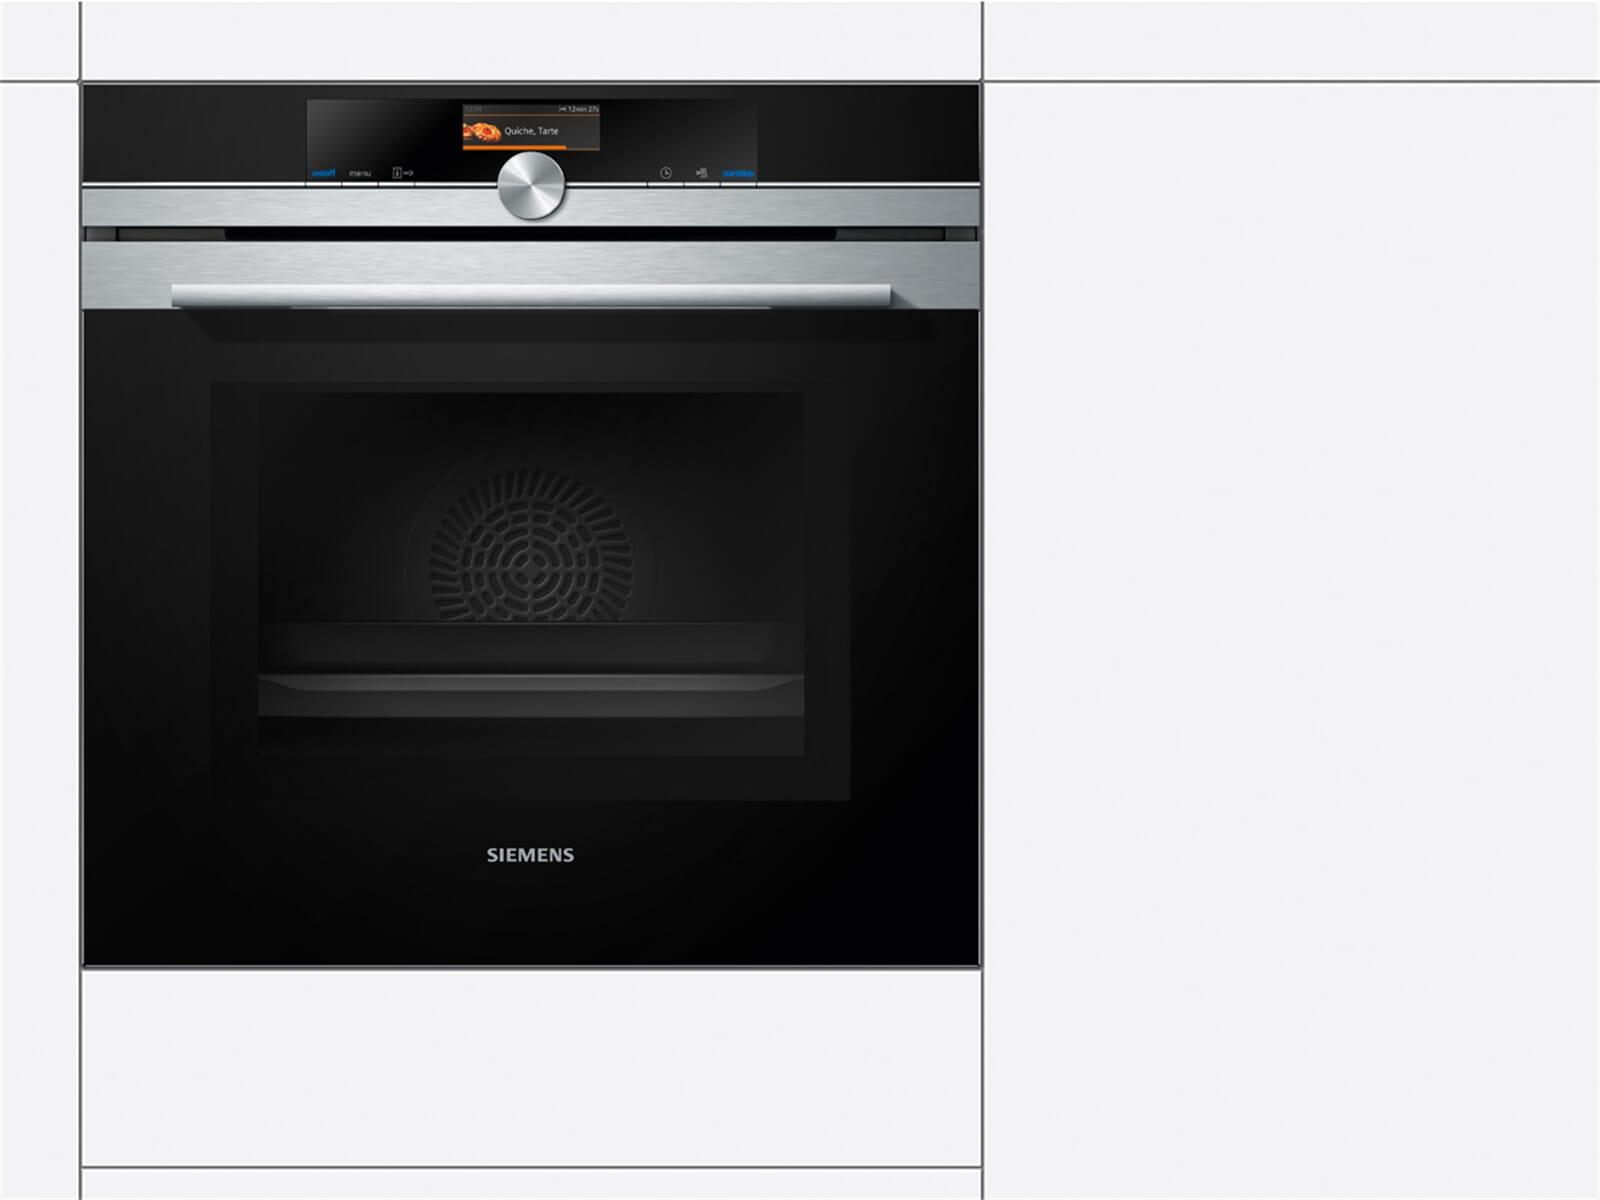 siemens hm676g0s1 pyrolyse backofen mit mikrowelle edelstahl mikrowellenofen 67l ebay. Black Bedroom Furniture Sets. Home Design Ideas